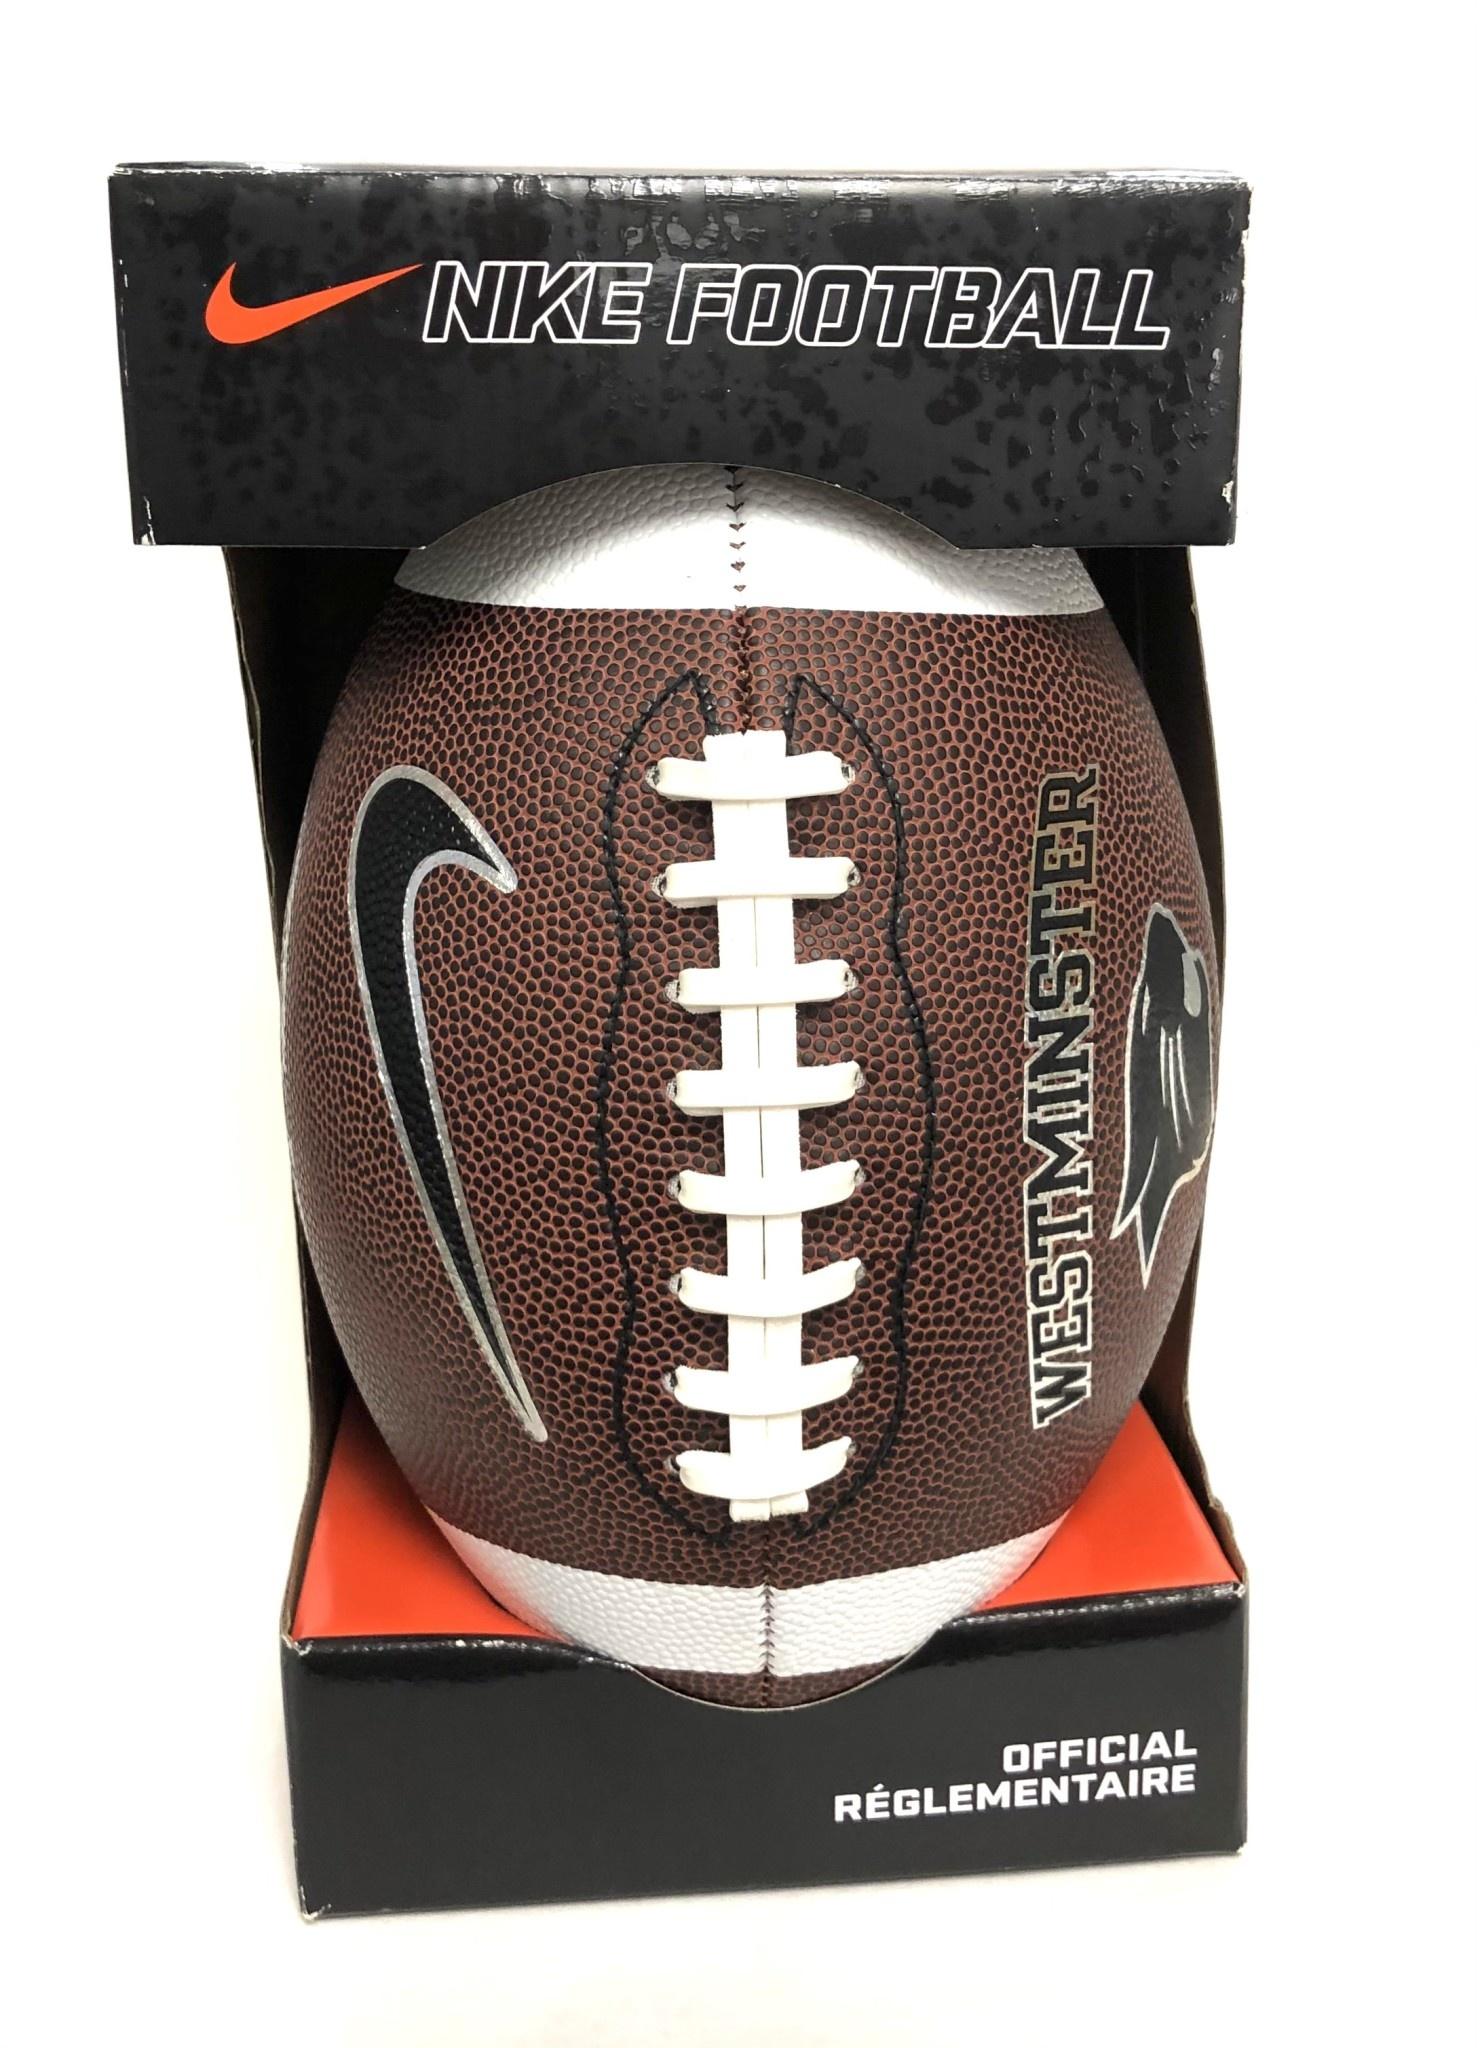 Nike Football: Nike Football Official